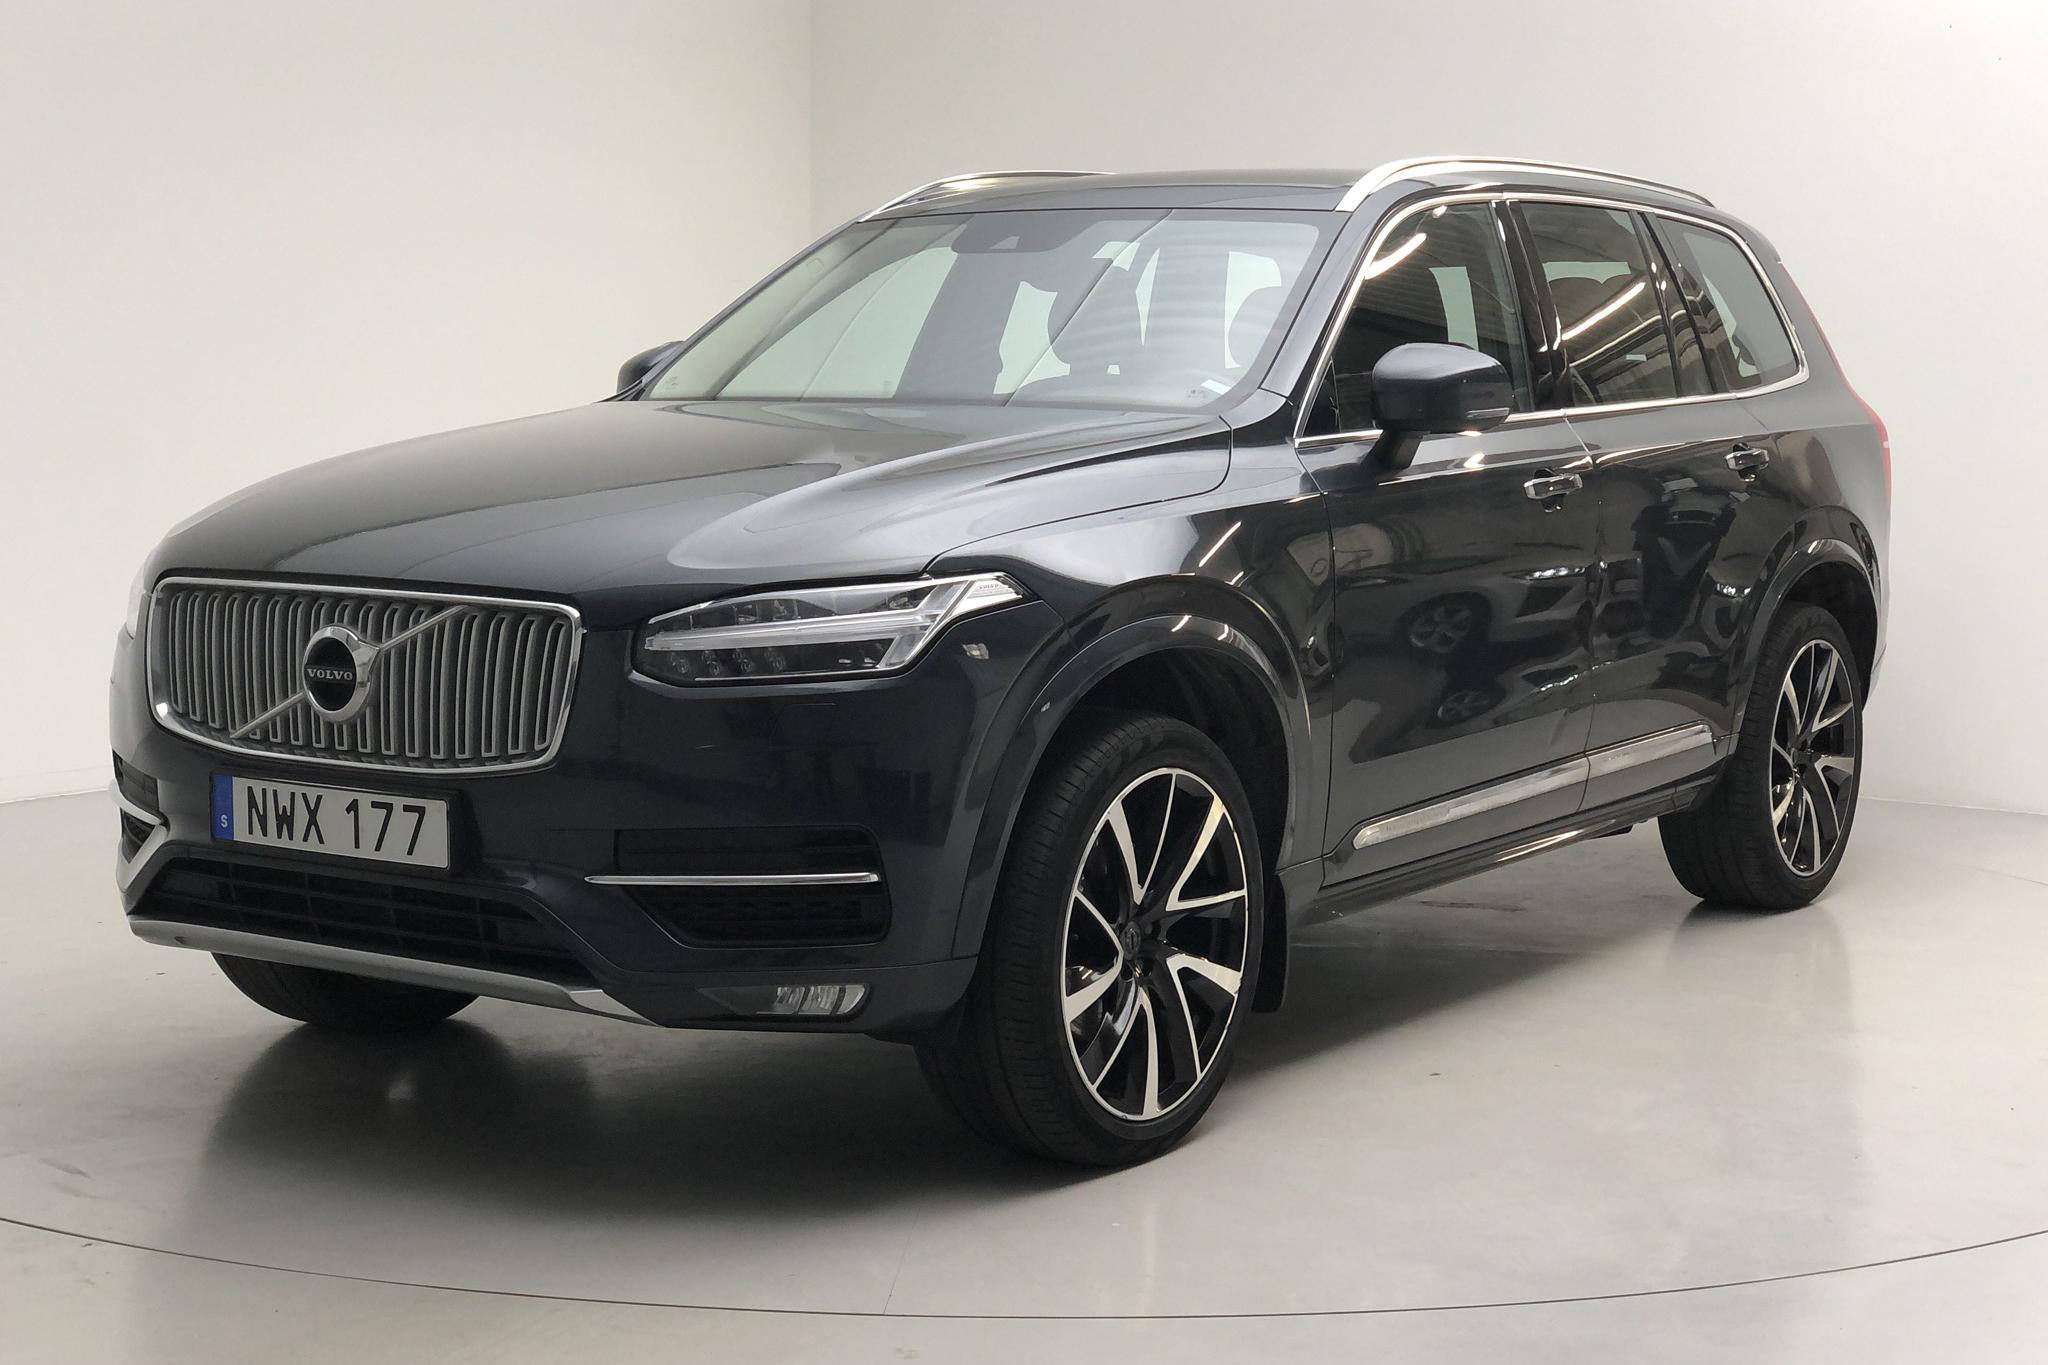 Volvo XC90 D4 AWD (190hk) - 8 722 mil - Automat - grå - 2018